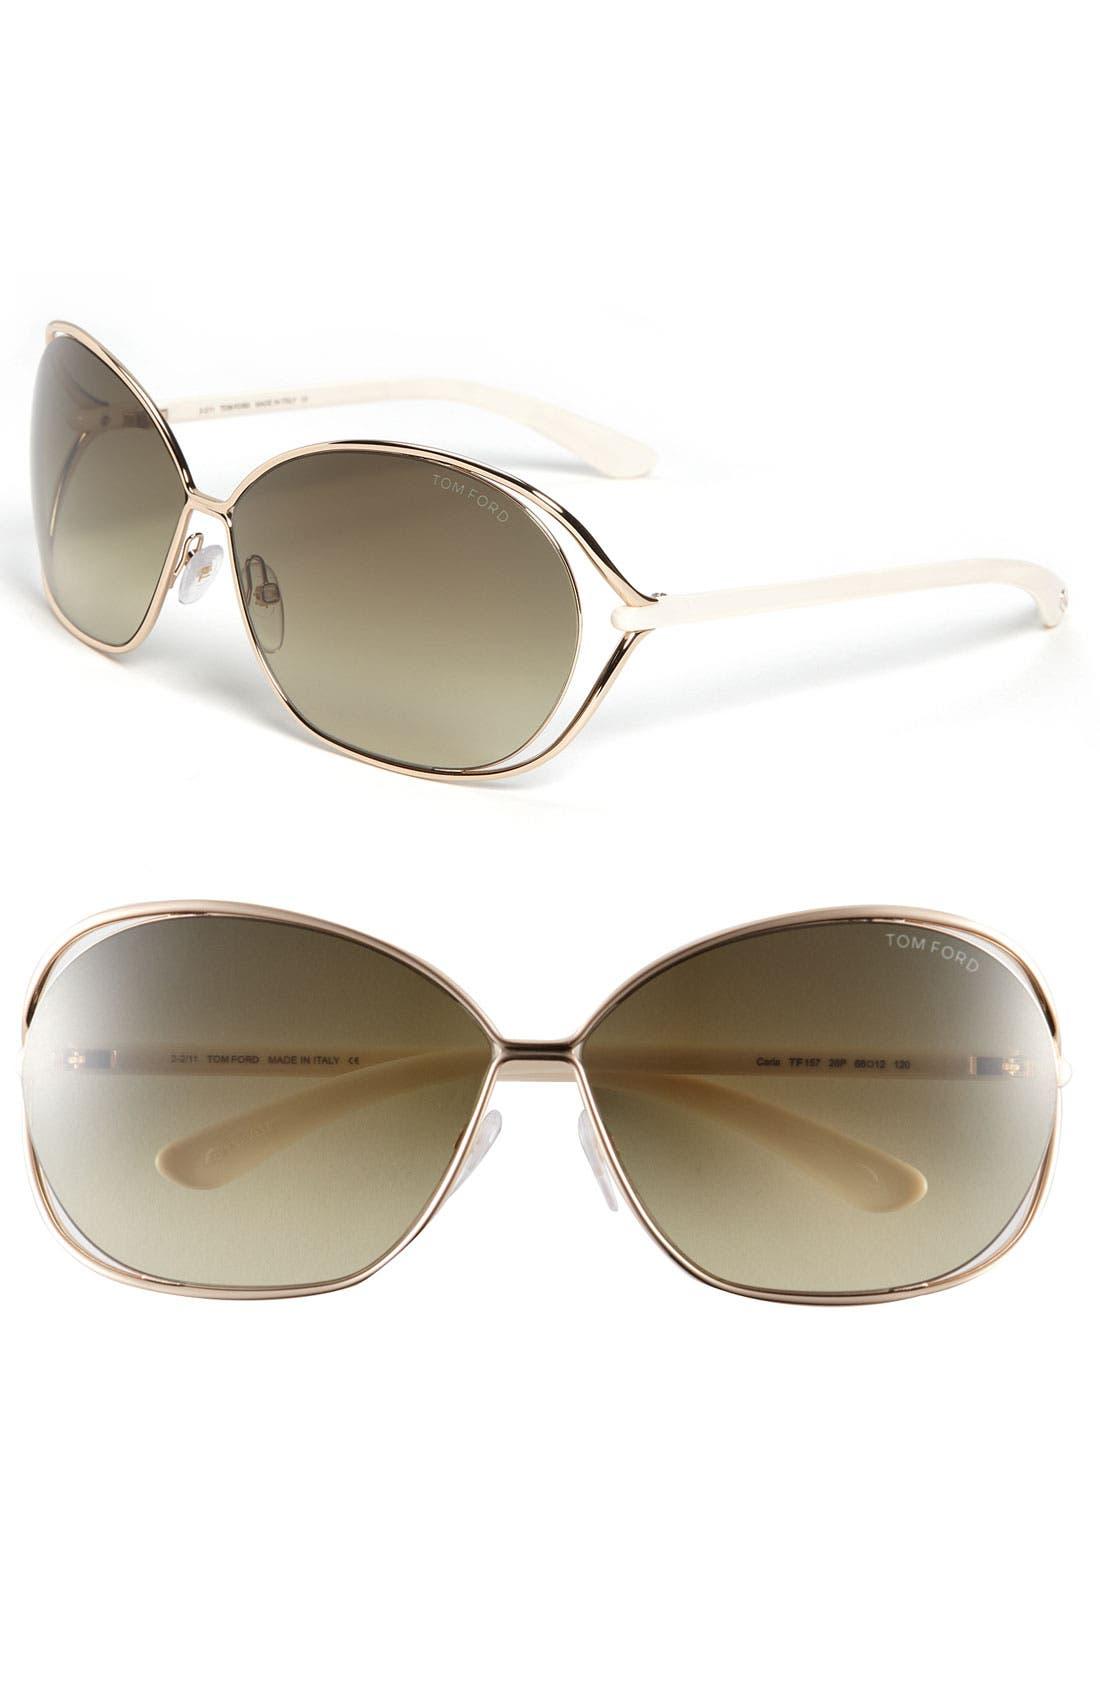 Main Image - Tom Ford 'Carla' 66mm Oversized Round Metal Sunglasses